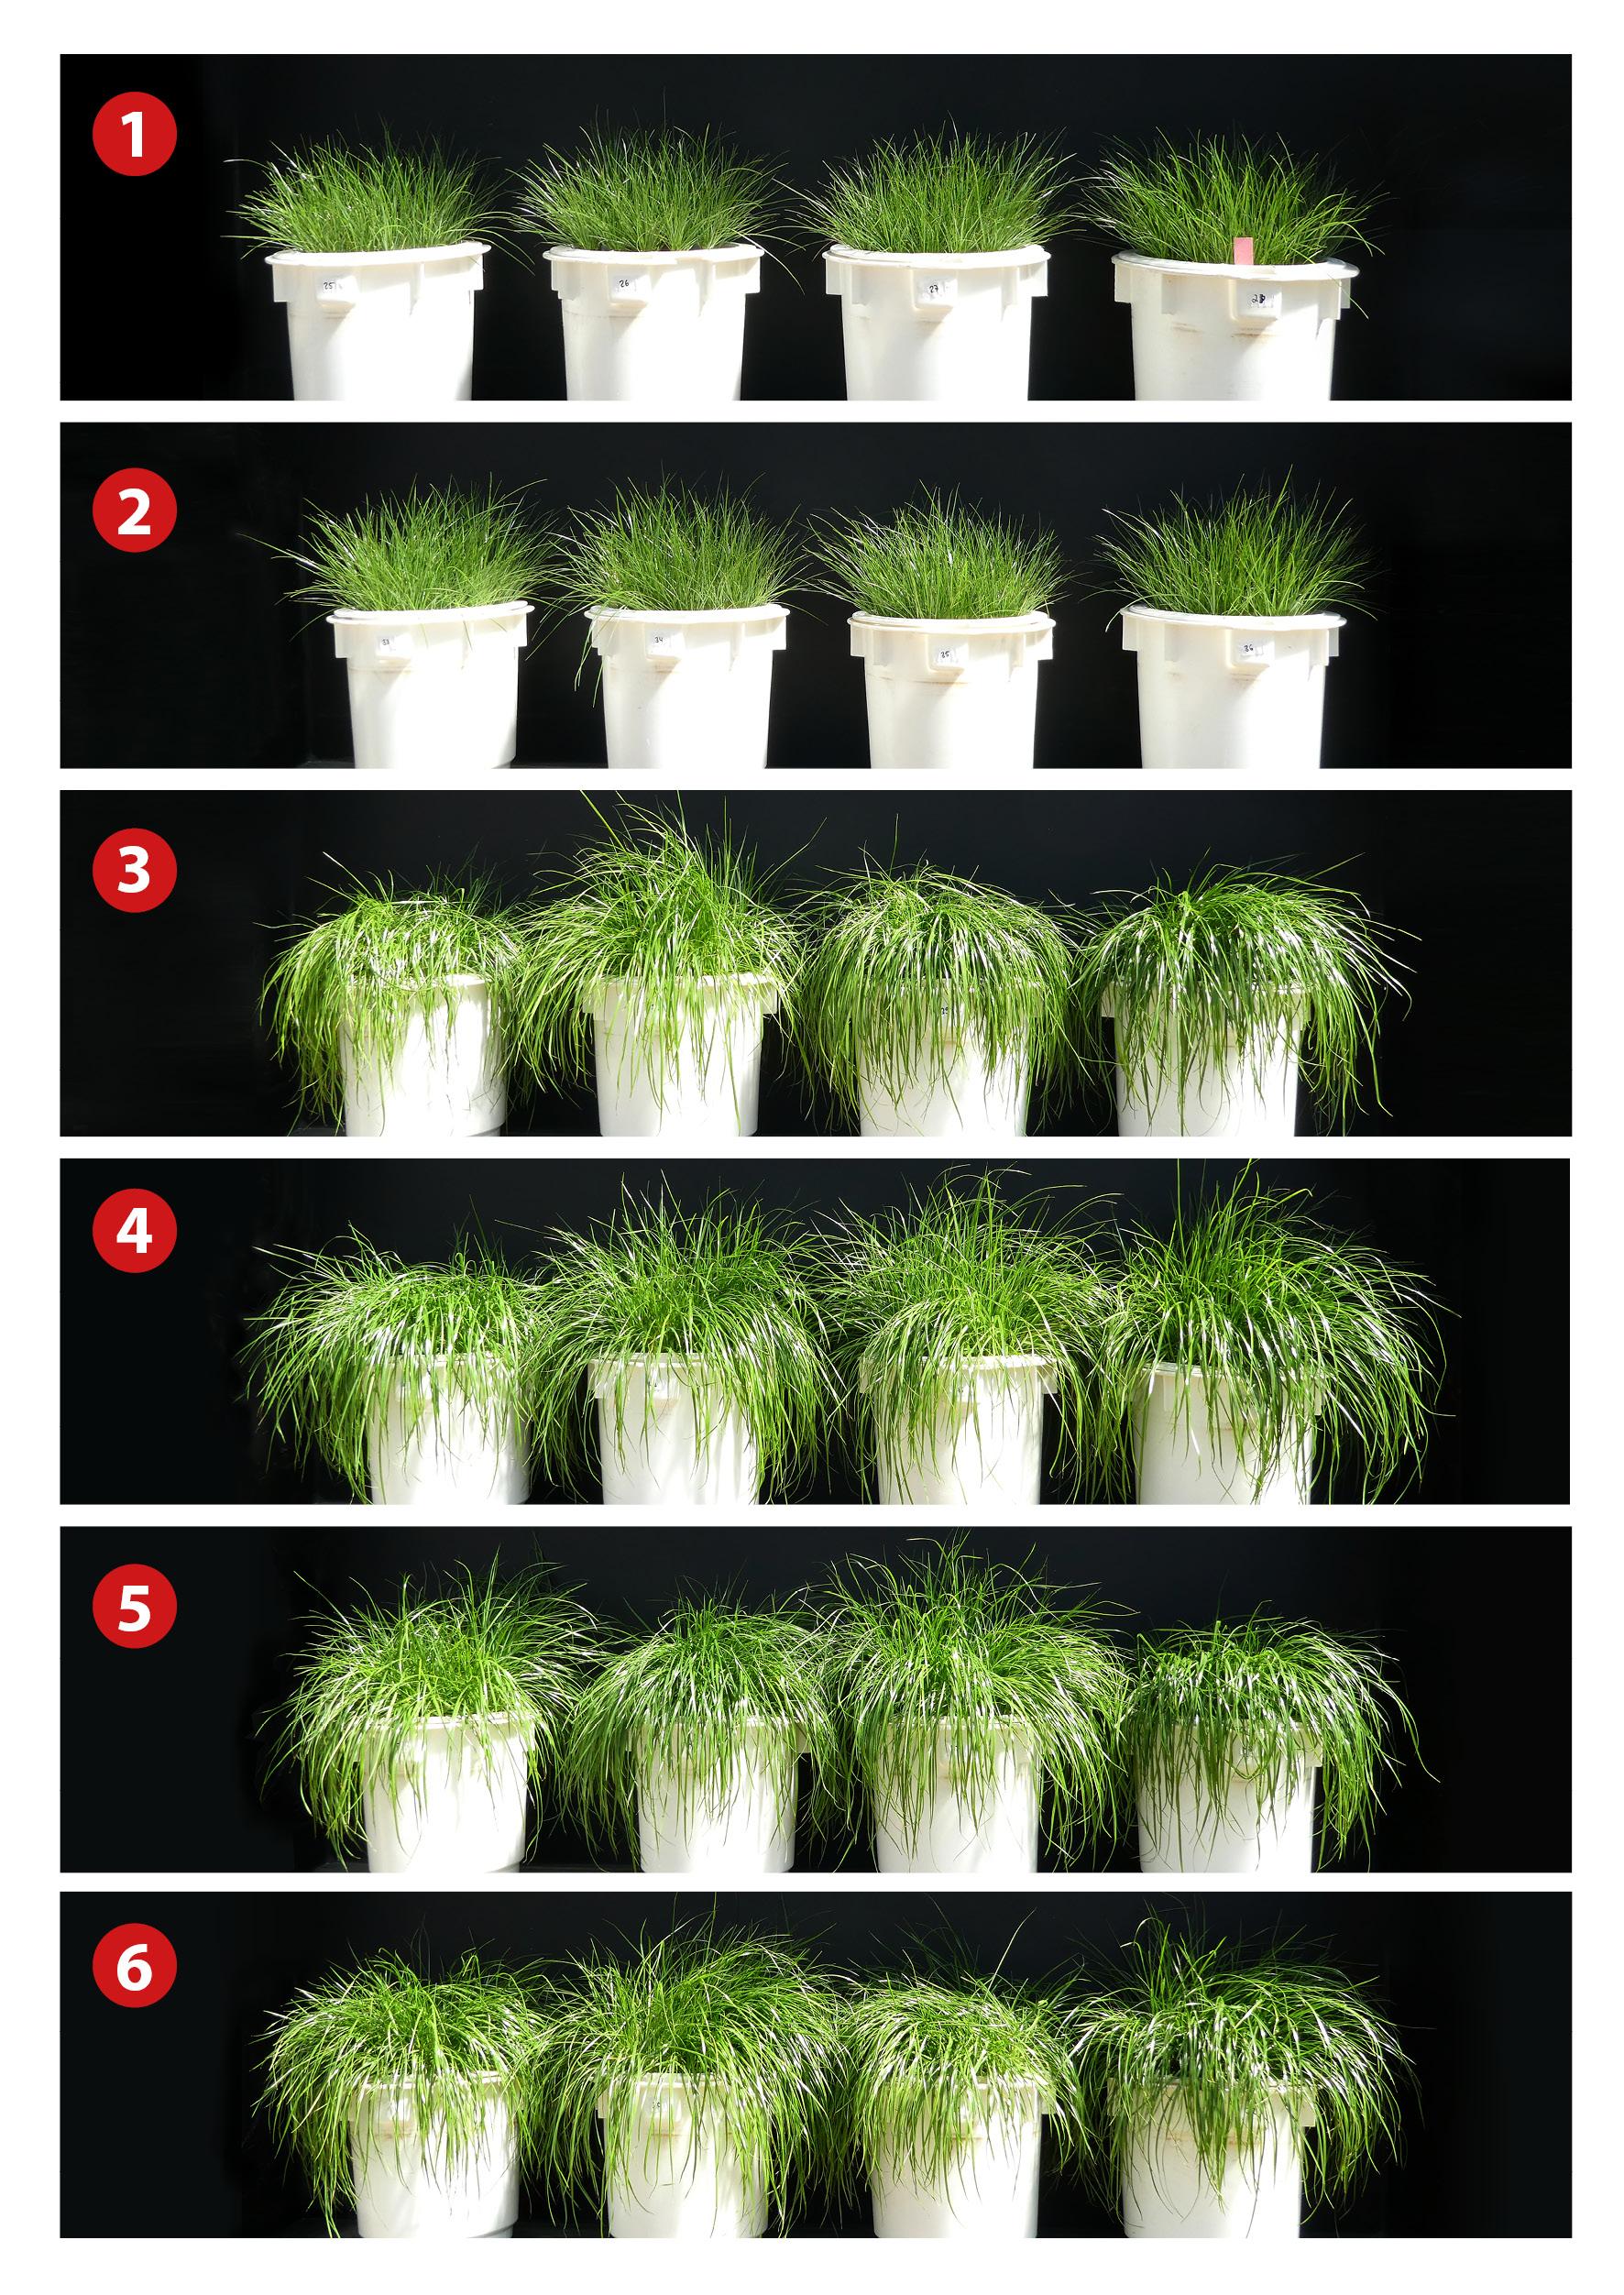 Glatt_PHOS4green-Planting-Trials_Harvest1_Ryegrass_Lollium